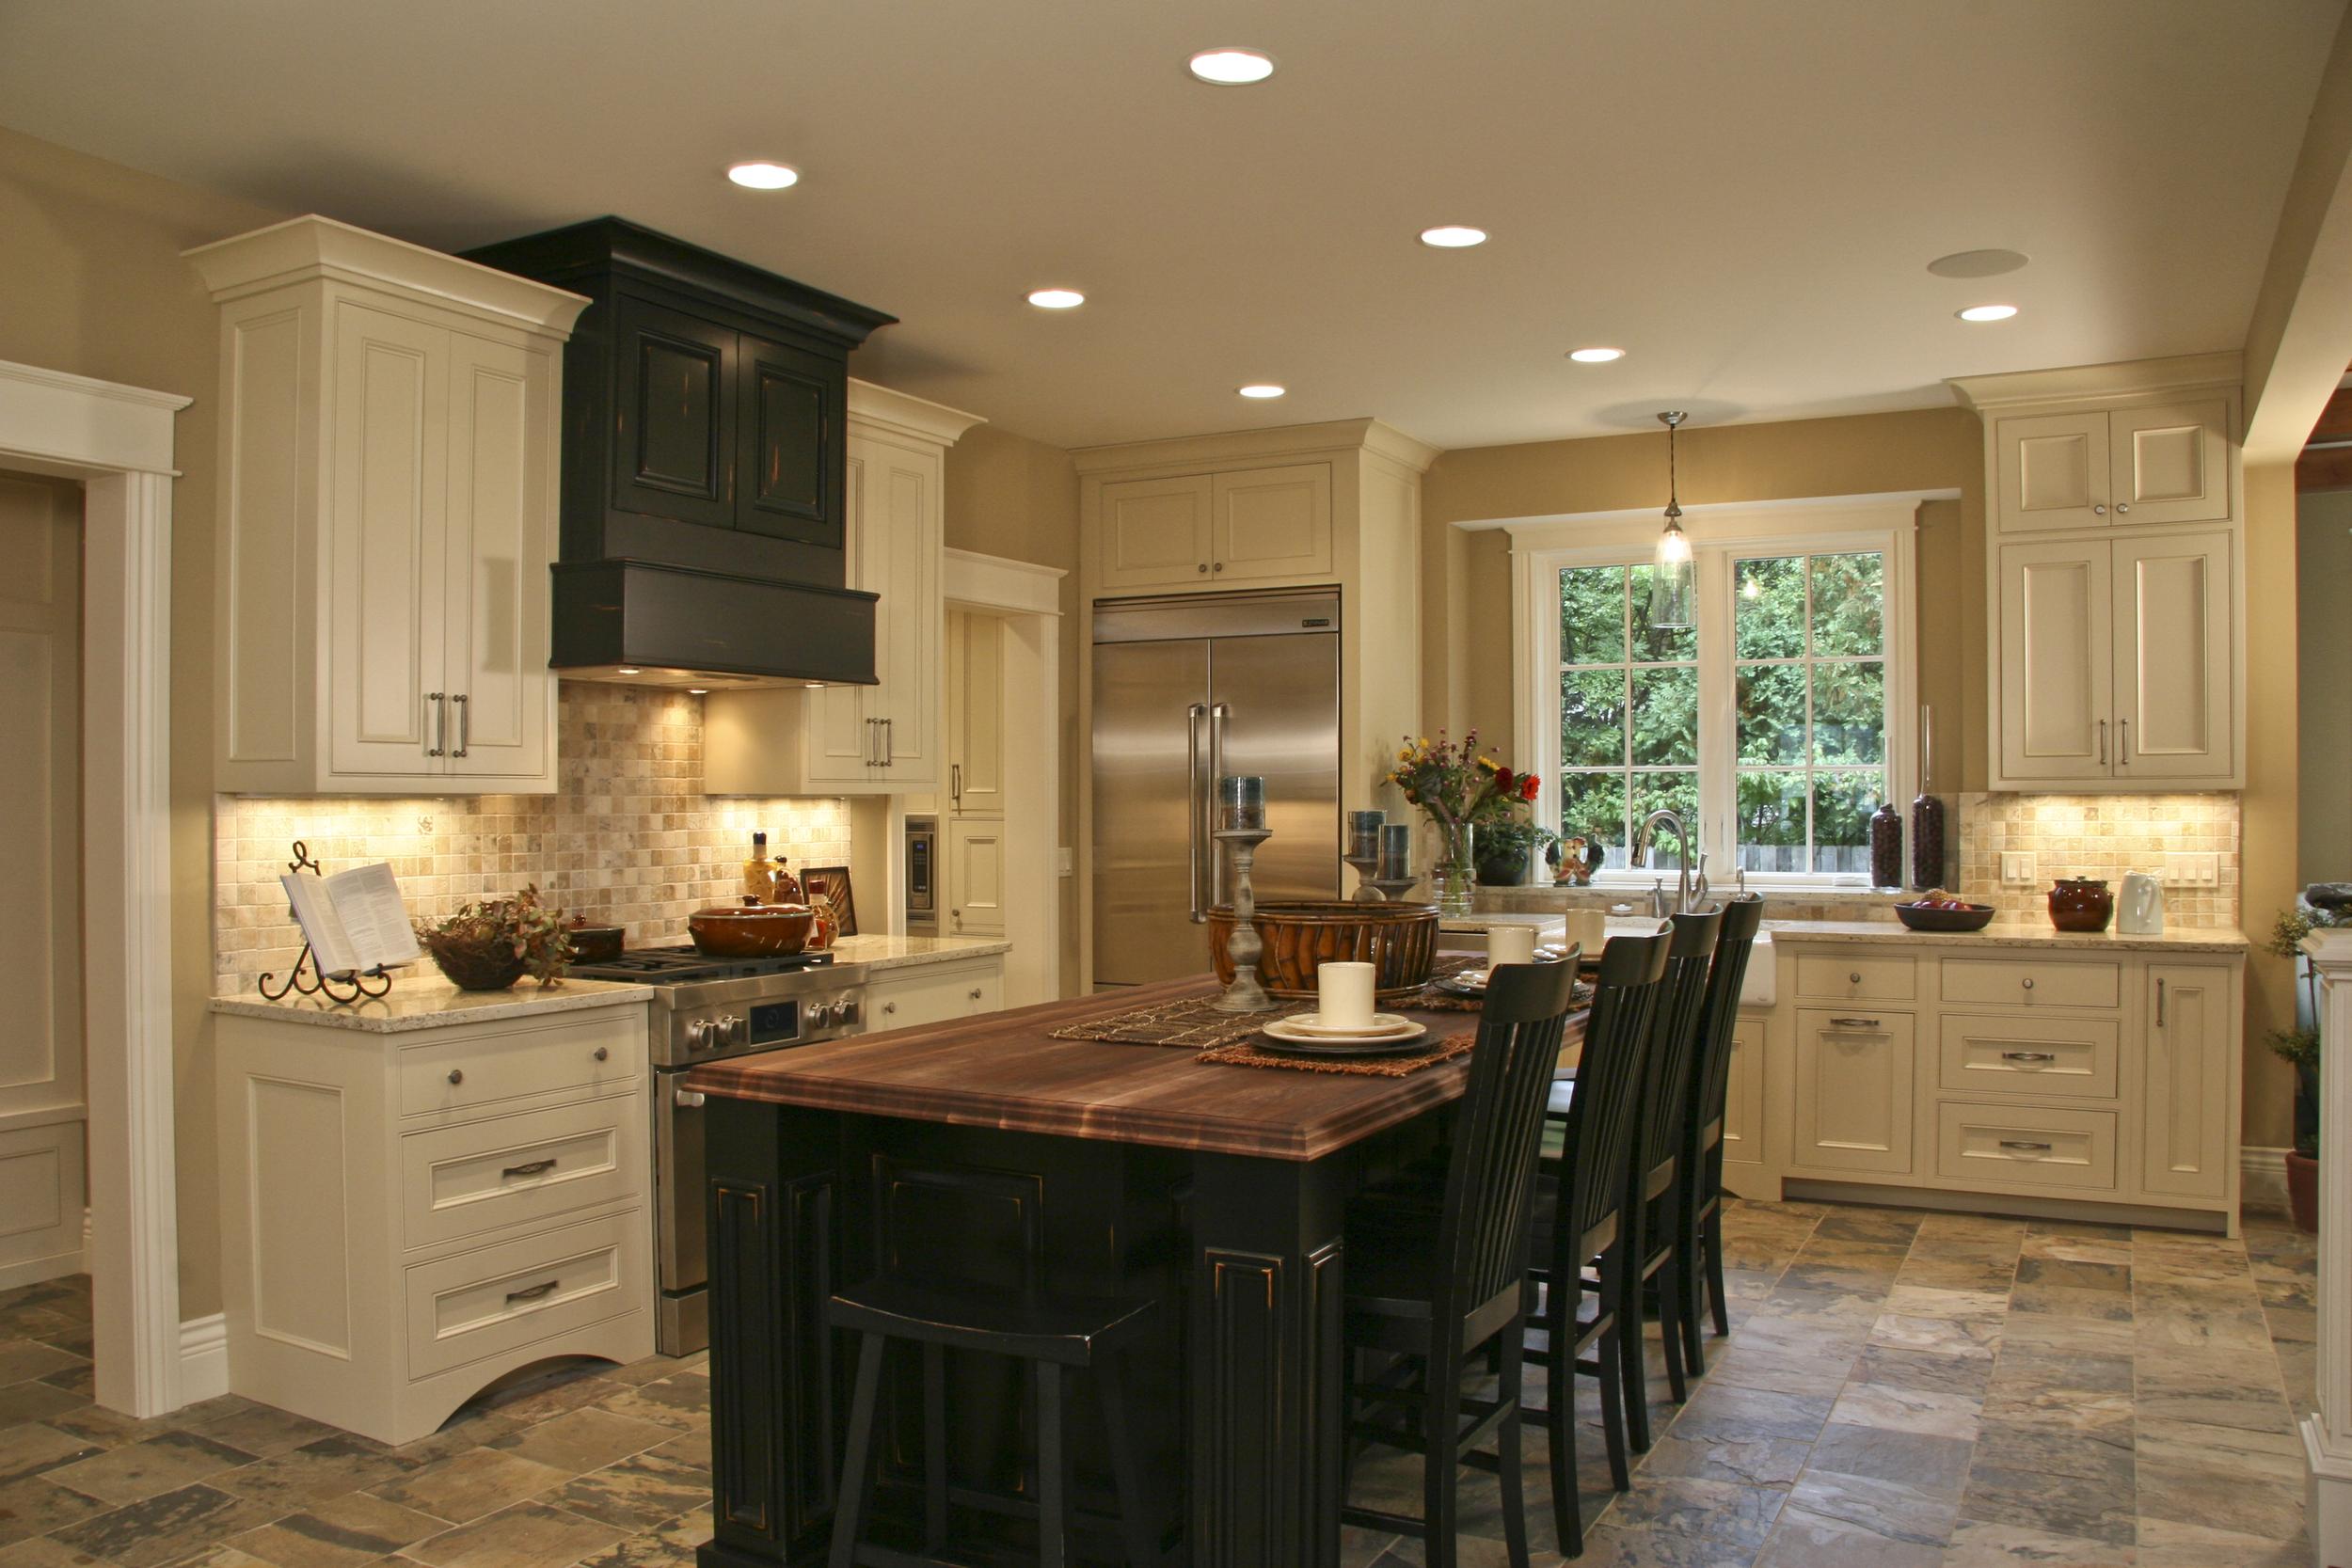 kitchen_IMG_0033-1.jpg